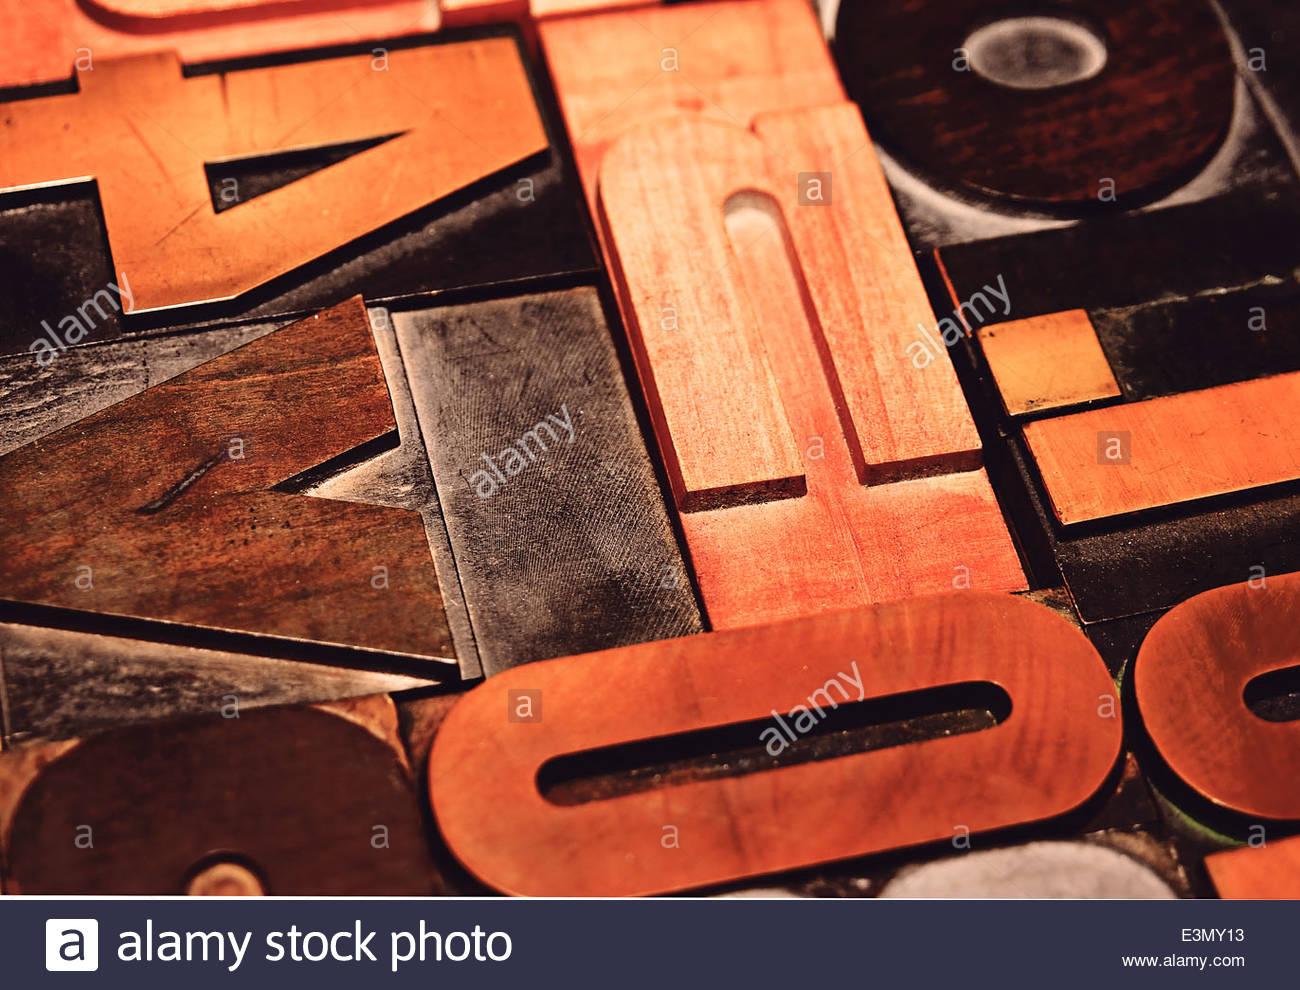 Ein Sortiment an Holzlettern für den Druck(An assortment of wooden letters for printing) - Stock Image